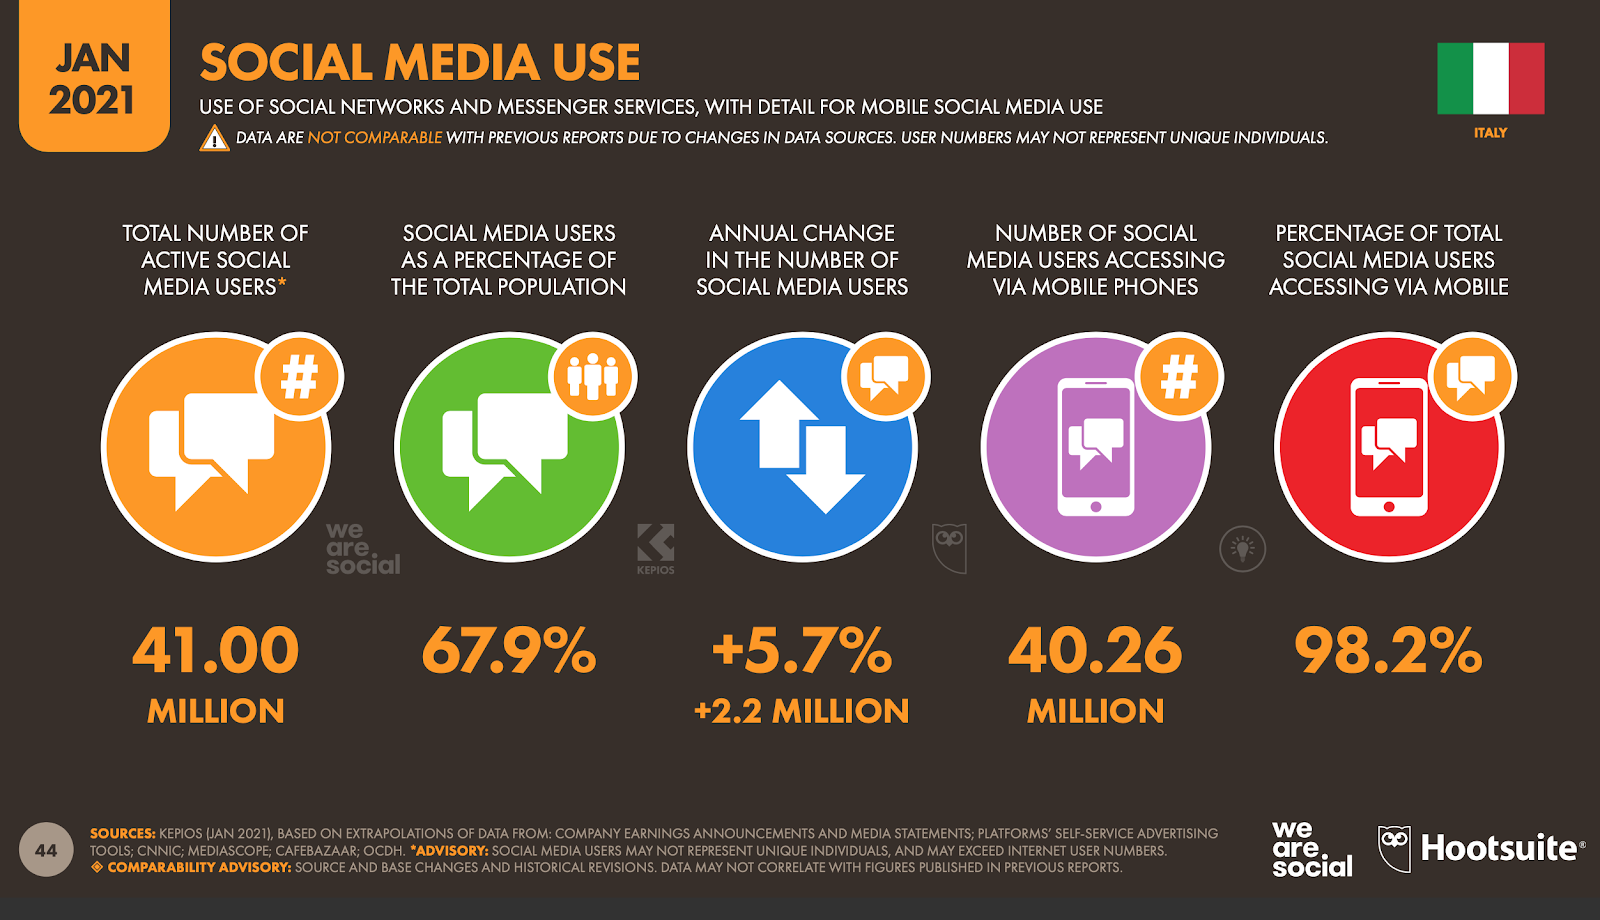 statistiche-uso-social-media